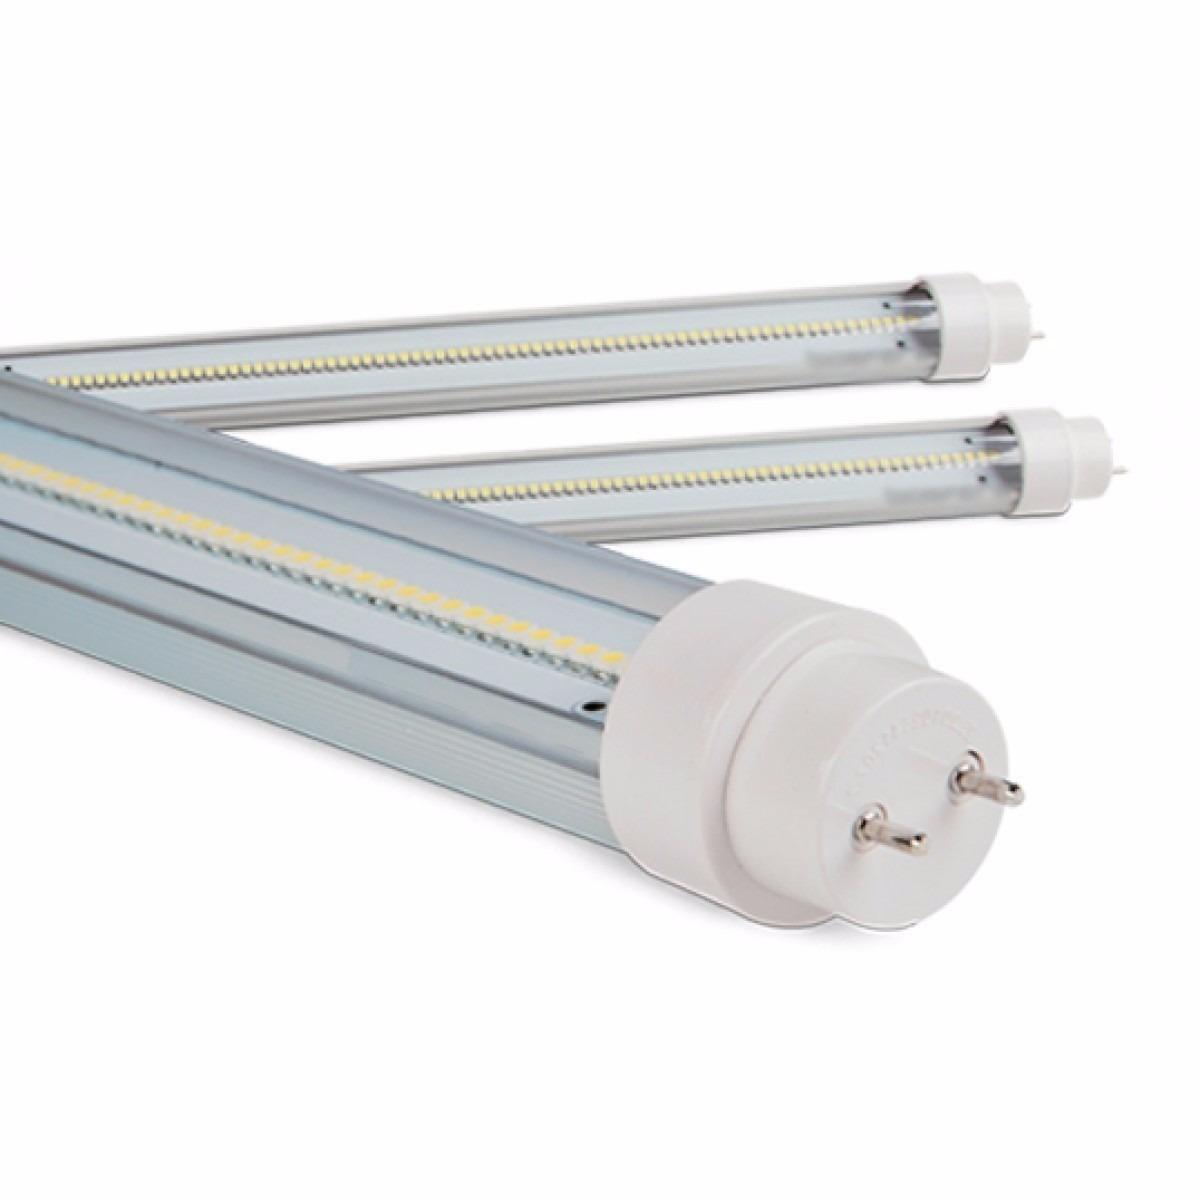 Lampada led tubular t8 tubo 60cm 9w branco frio 6000k r for Lampada led